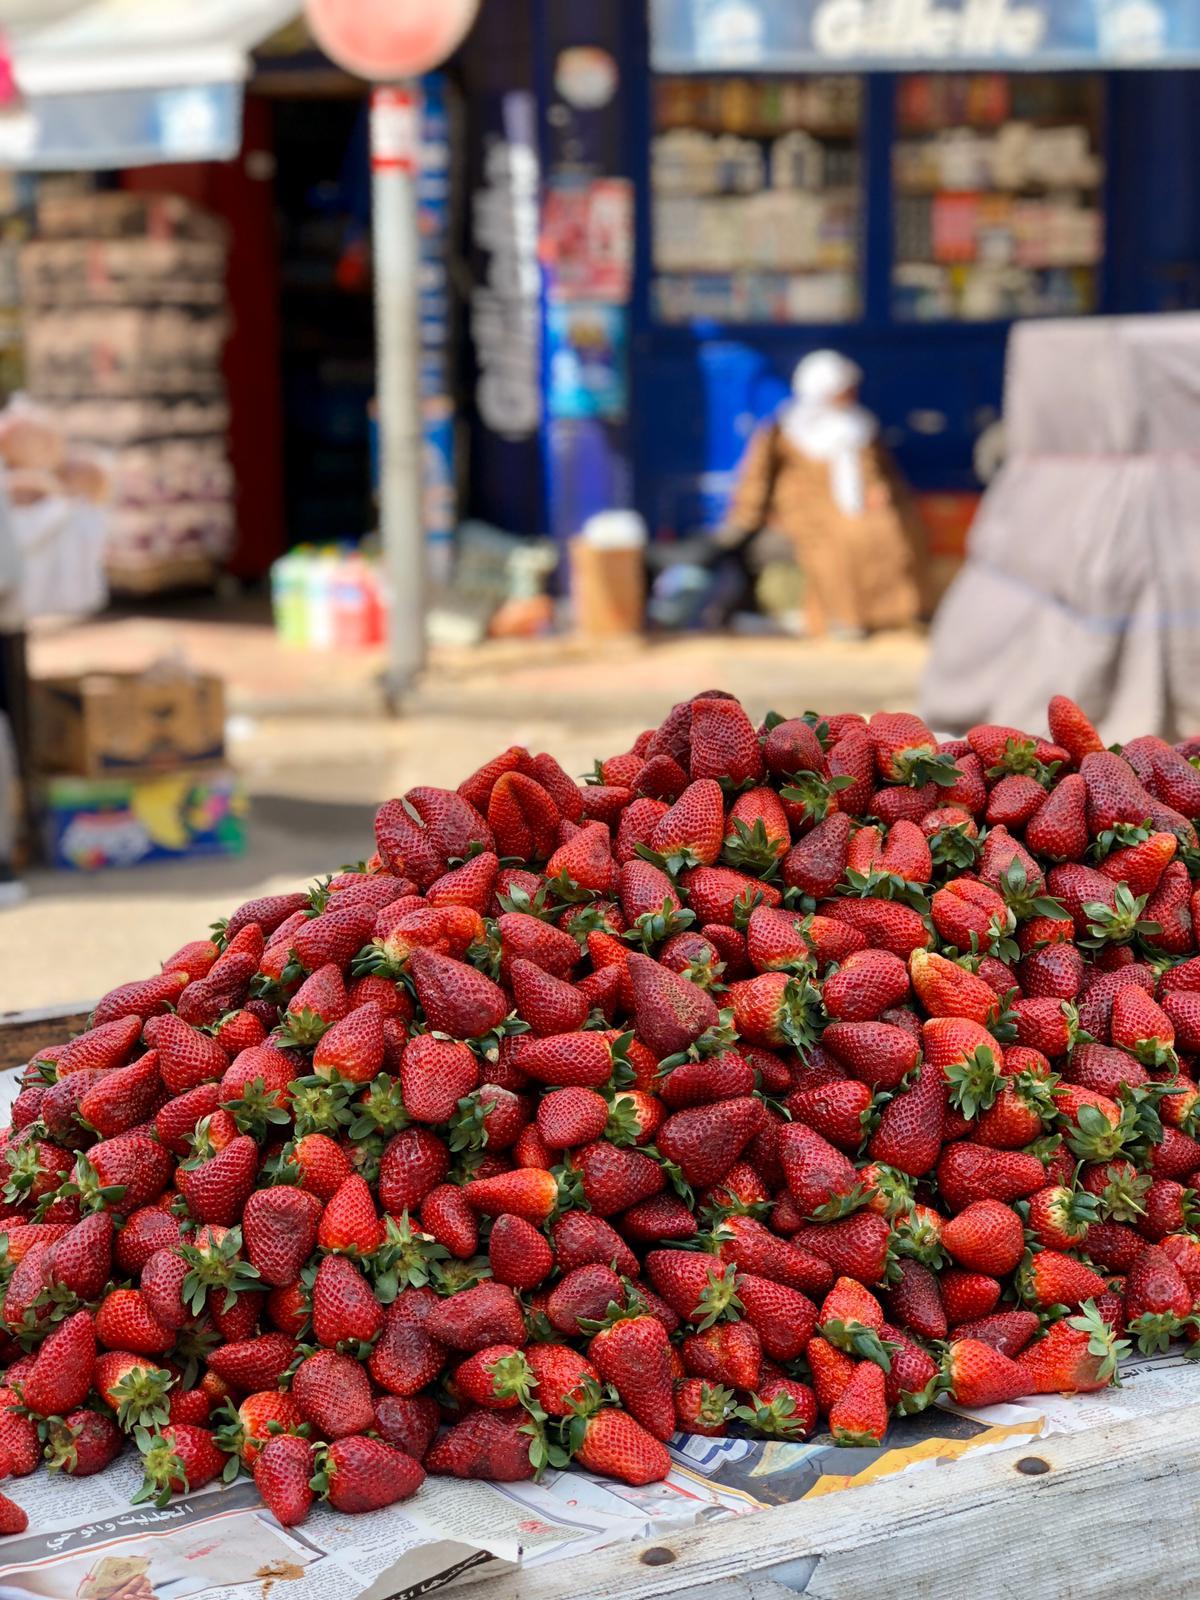 morocco bruce marais travel photography market strawberries